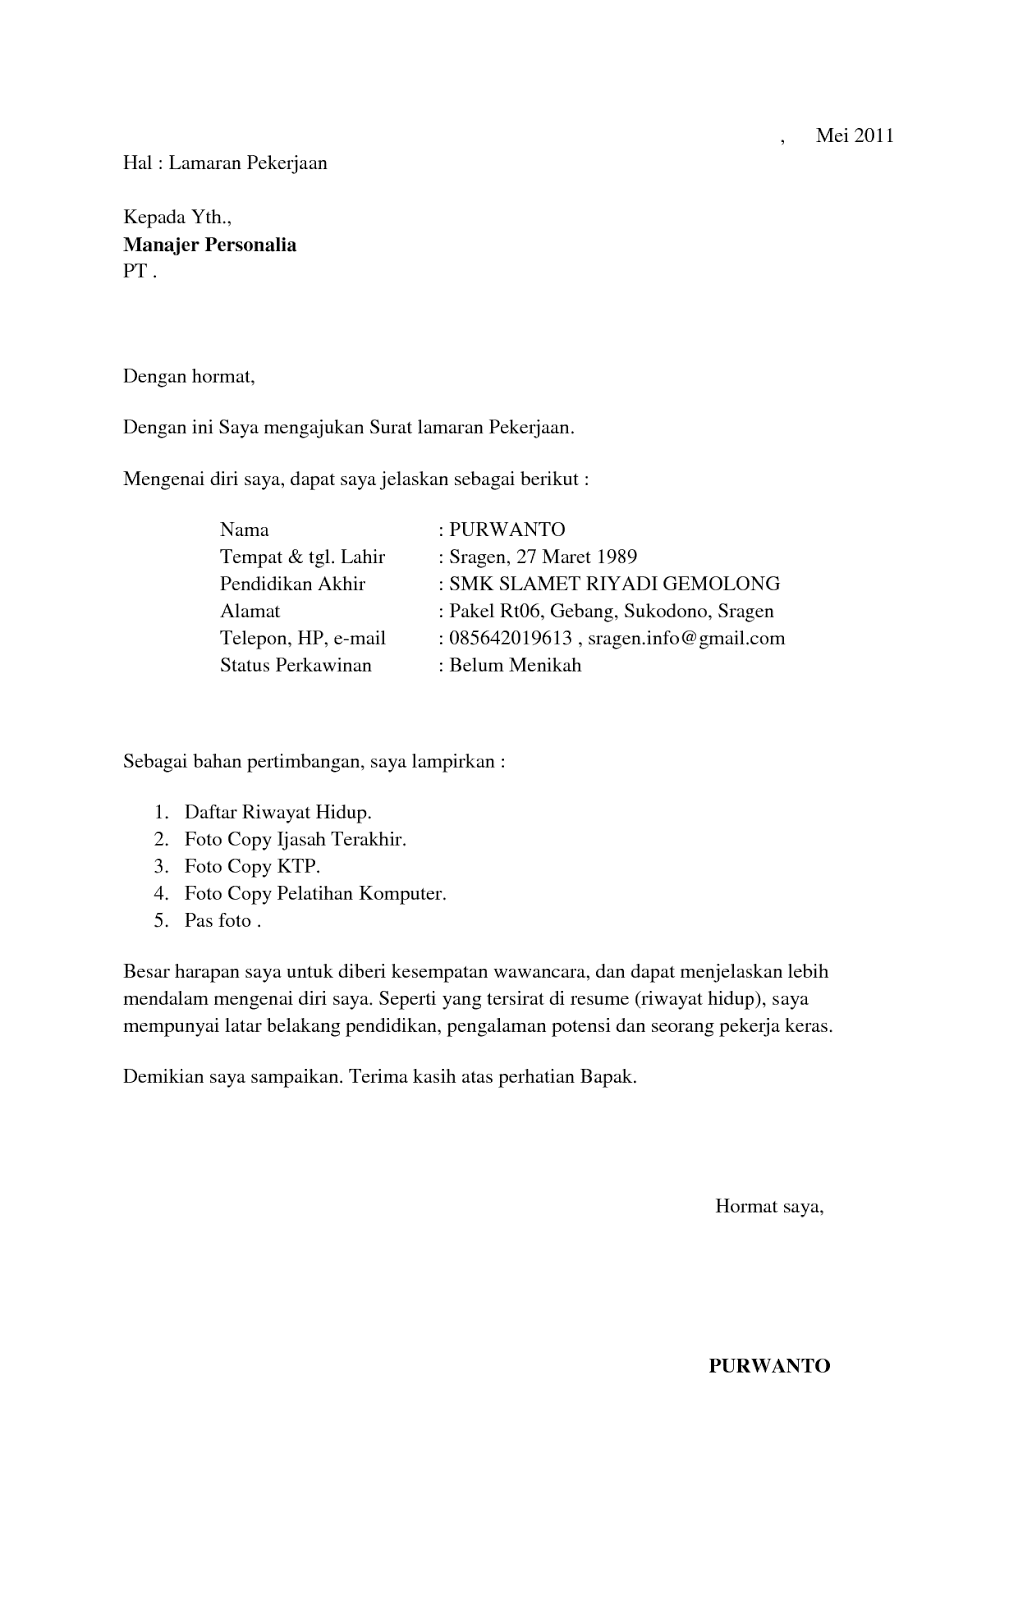 50 Contoh Surat Lamaran Kerja Tulis Tangan Menurut Bahasa Indonesia Tulisan Kerja Surat